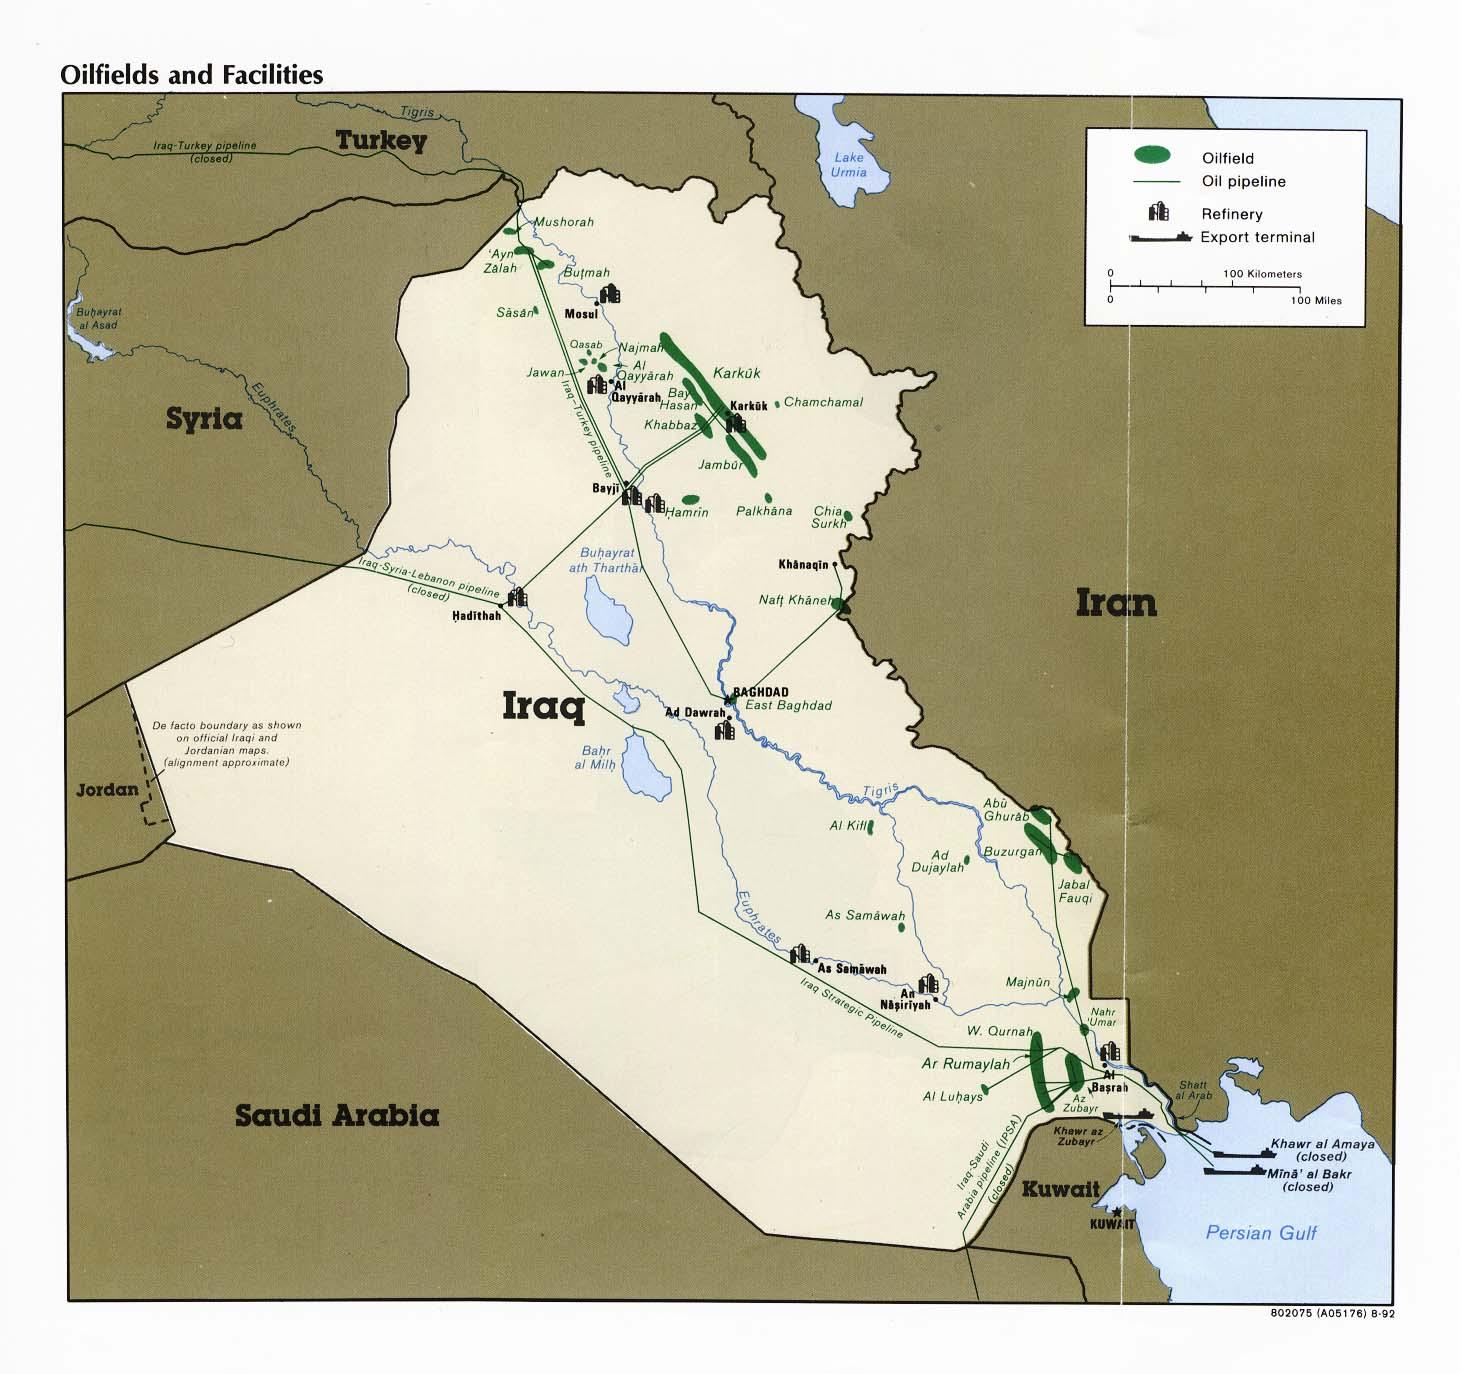 Iraqi Oil Fields and Facilities 1992